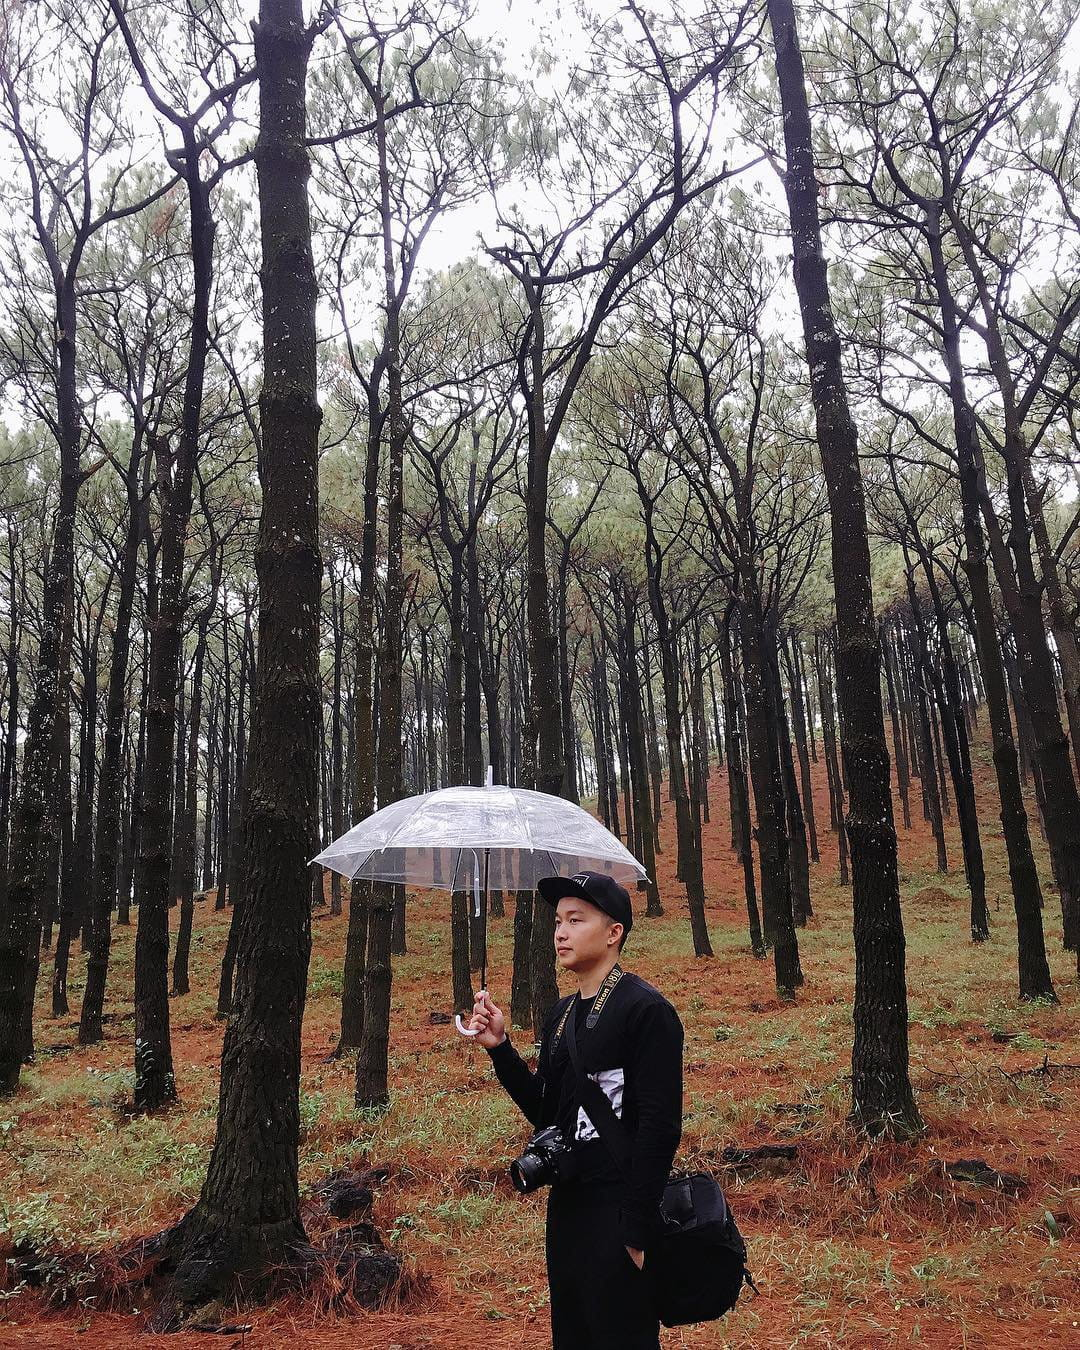 om-tim-hoc-kinh-nghiem-trekking-nui-da-chong-doc-nhat-viet-nam-ai-cung-muon-thu-21